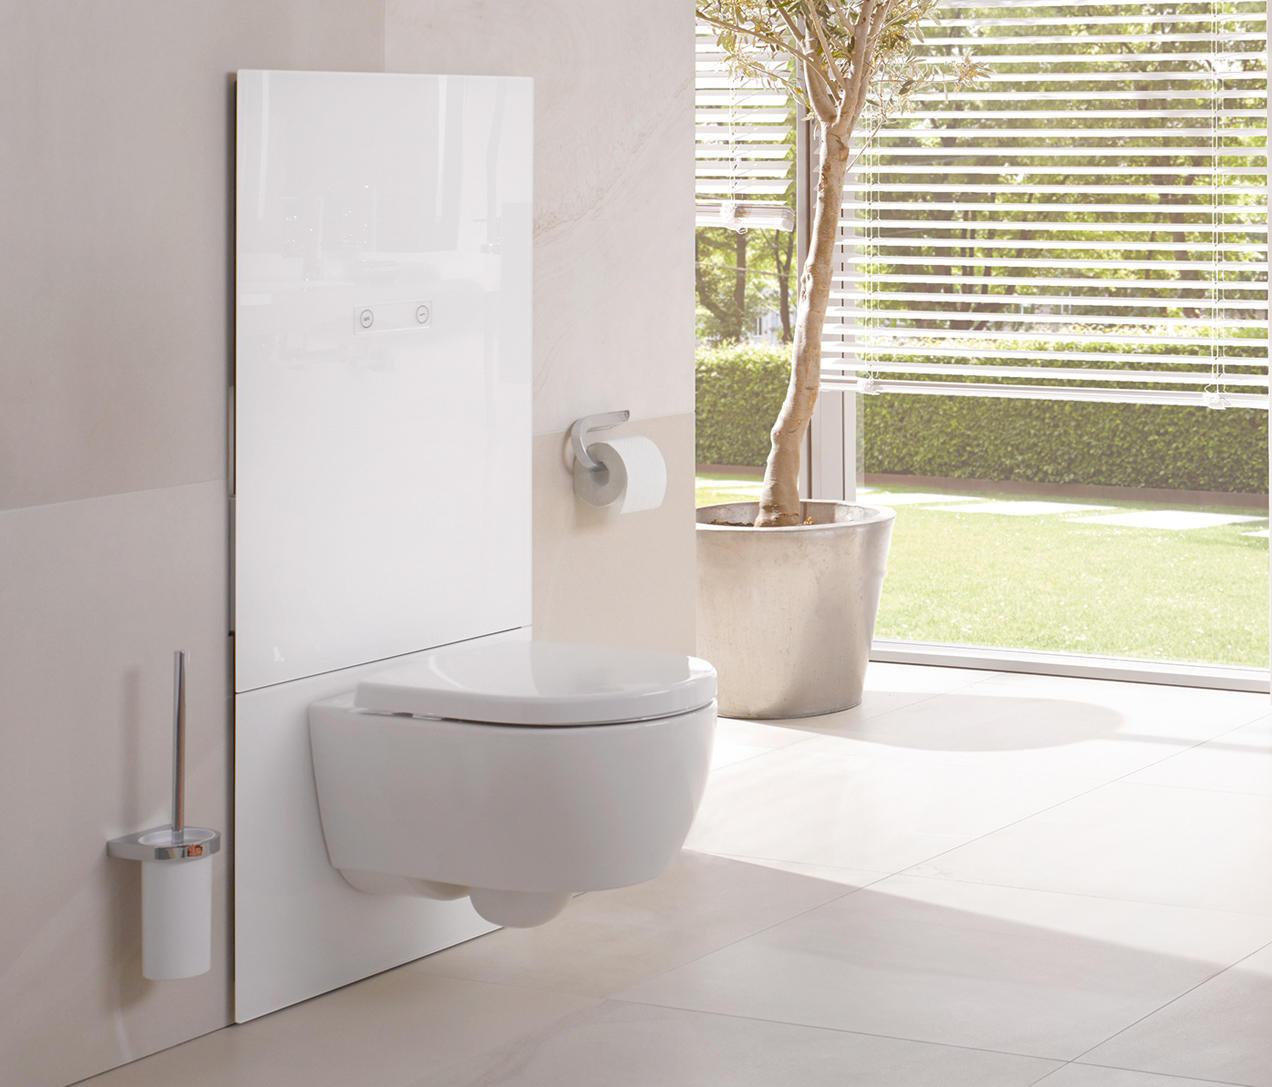 s 50 h henverstellbares wc klosetts von hewi architonic. Black Bedroom Furniture Sets. Home Design Ideas